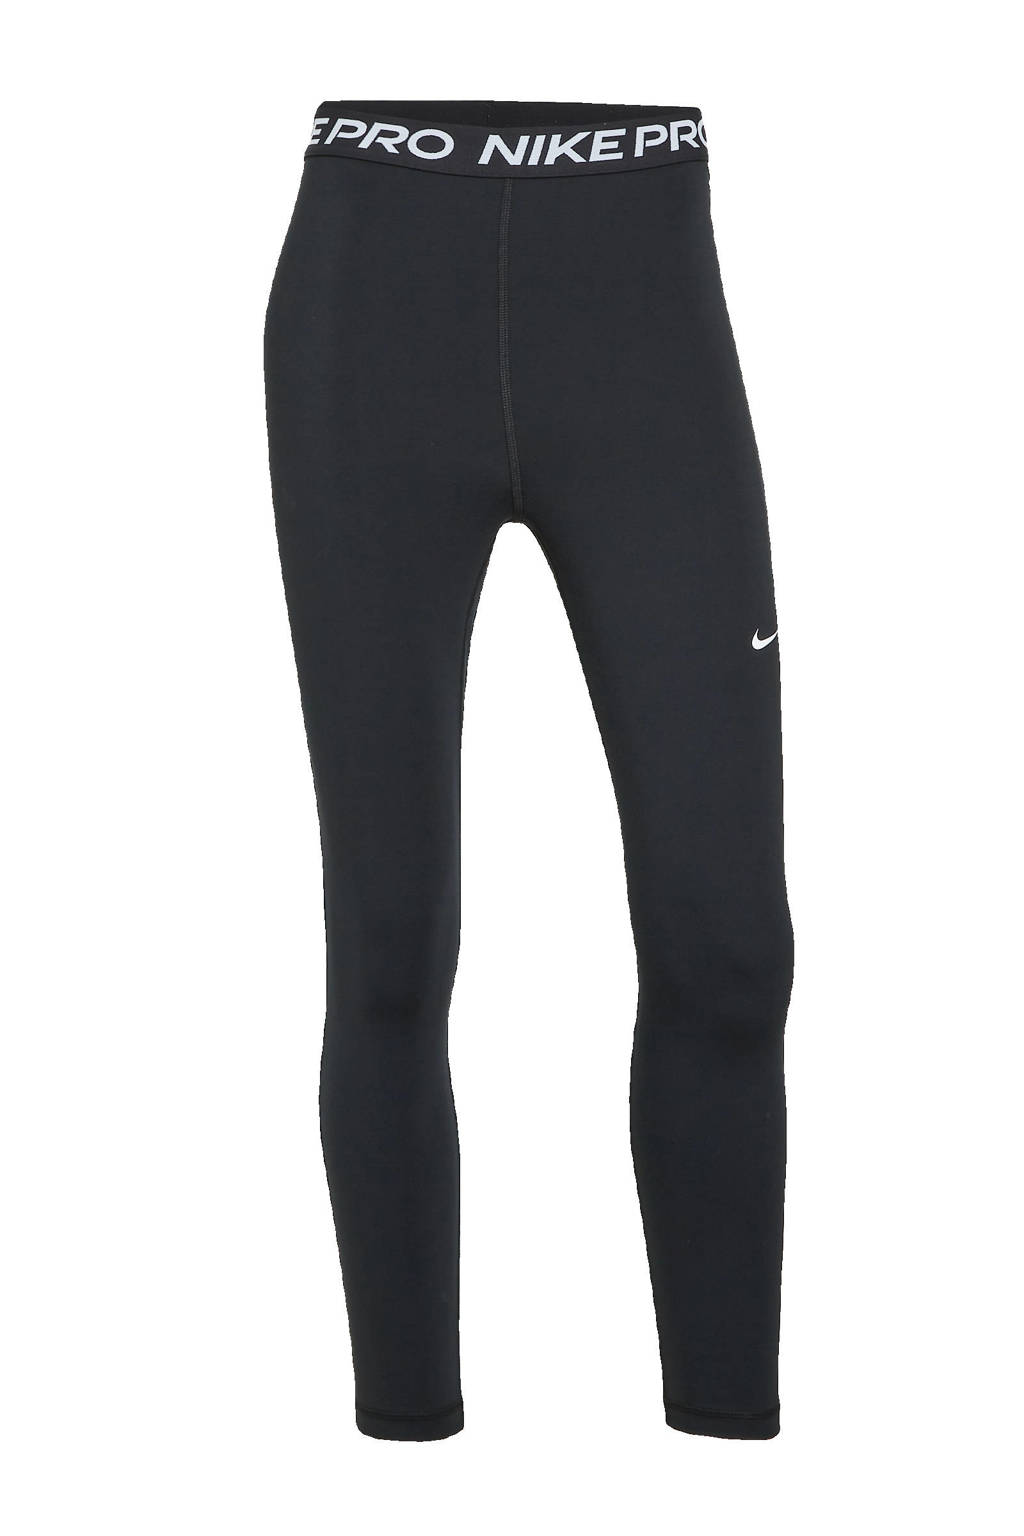 Nike 7/8 sportlegging zwart/wit, Zwart/wit